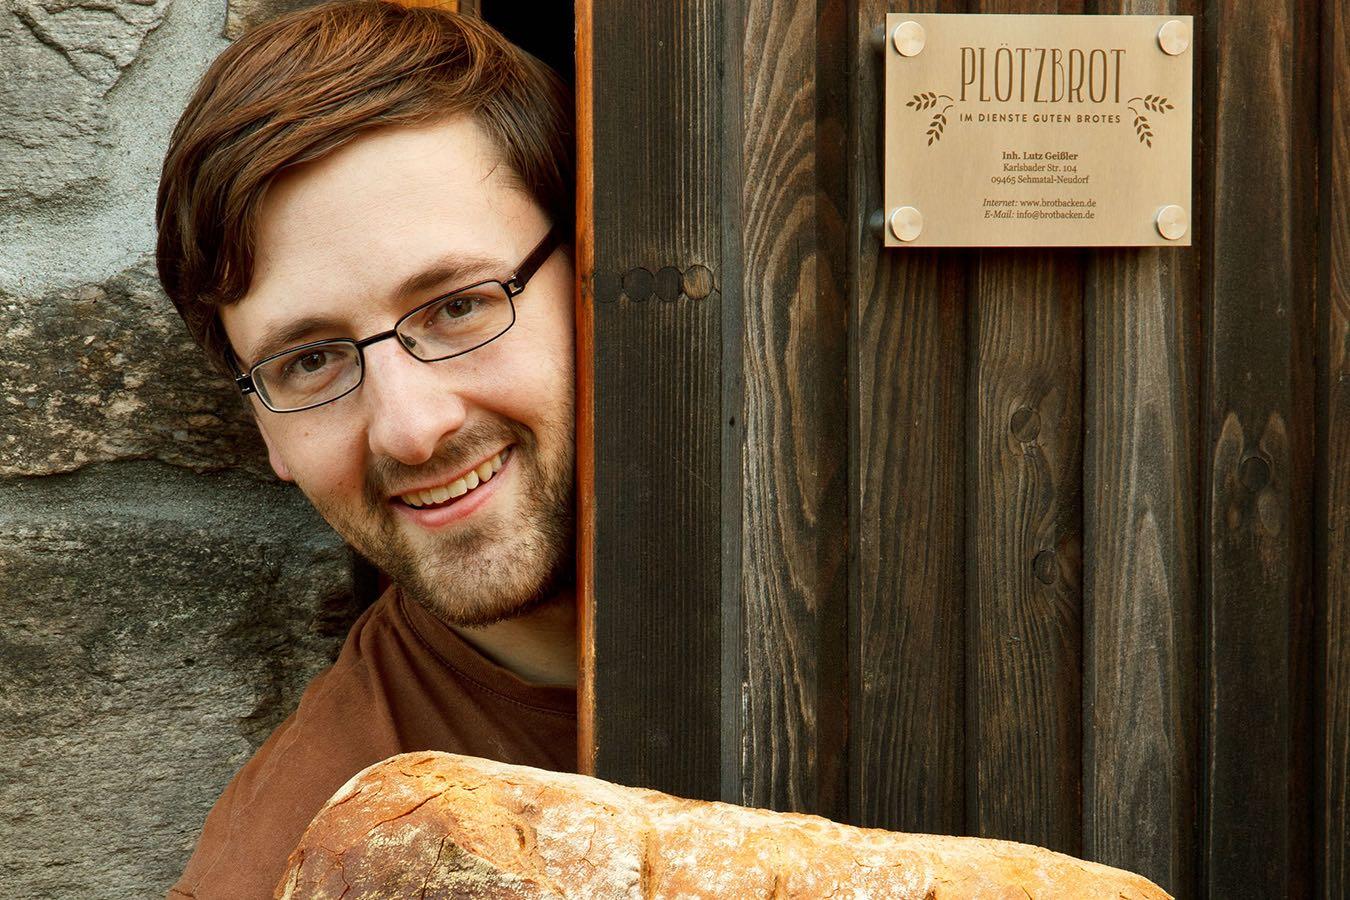 Makers: Lutz Geißler mit Plötzblog